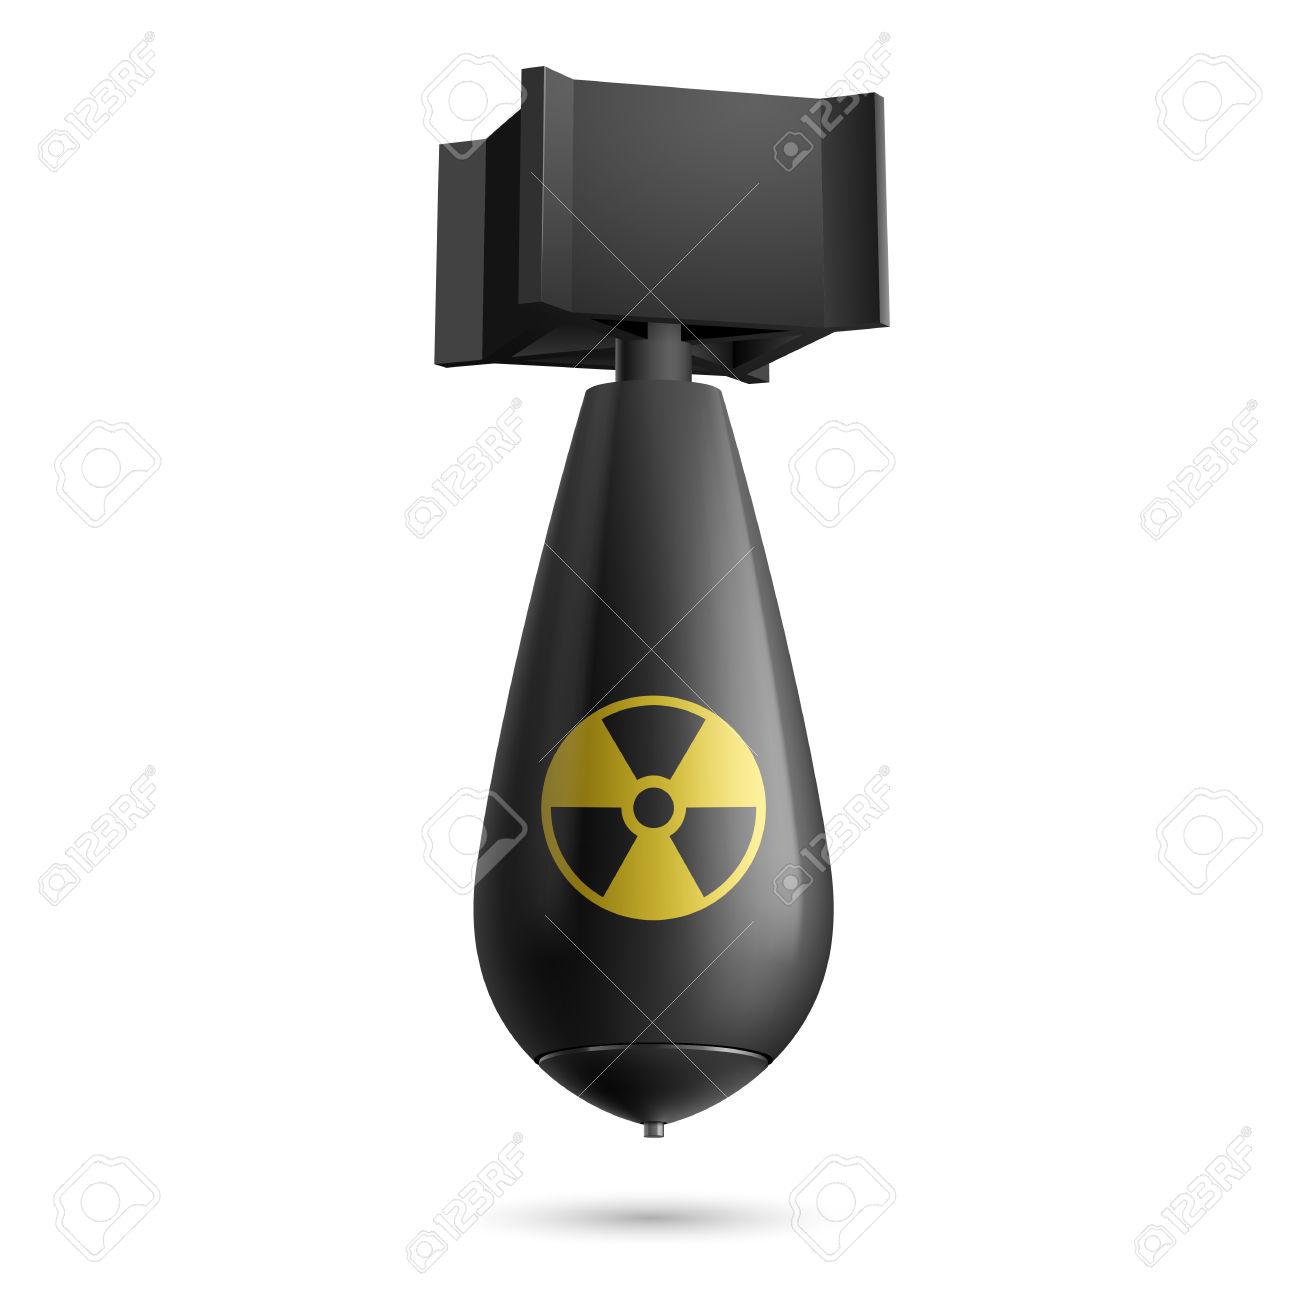 Illustration Of A Atomic Bomb .-Illustration of a atomic bomb .-16